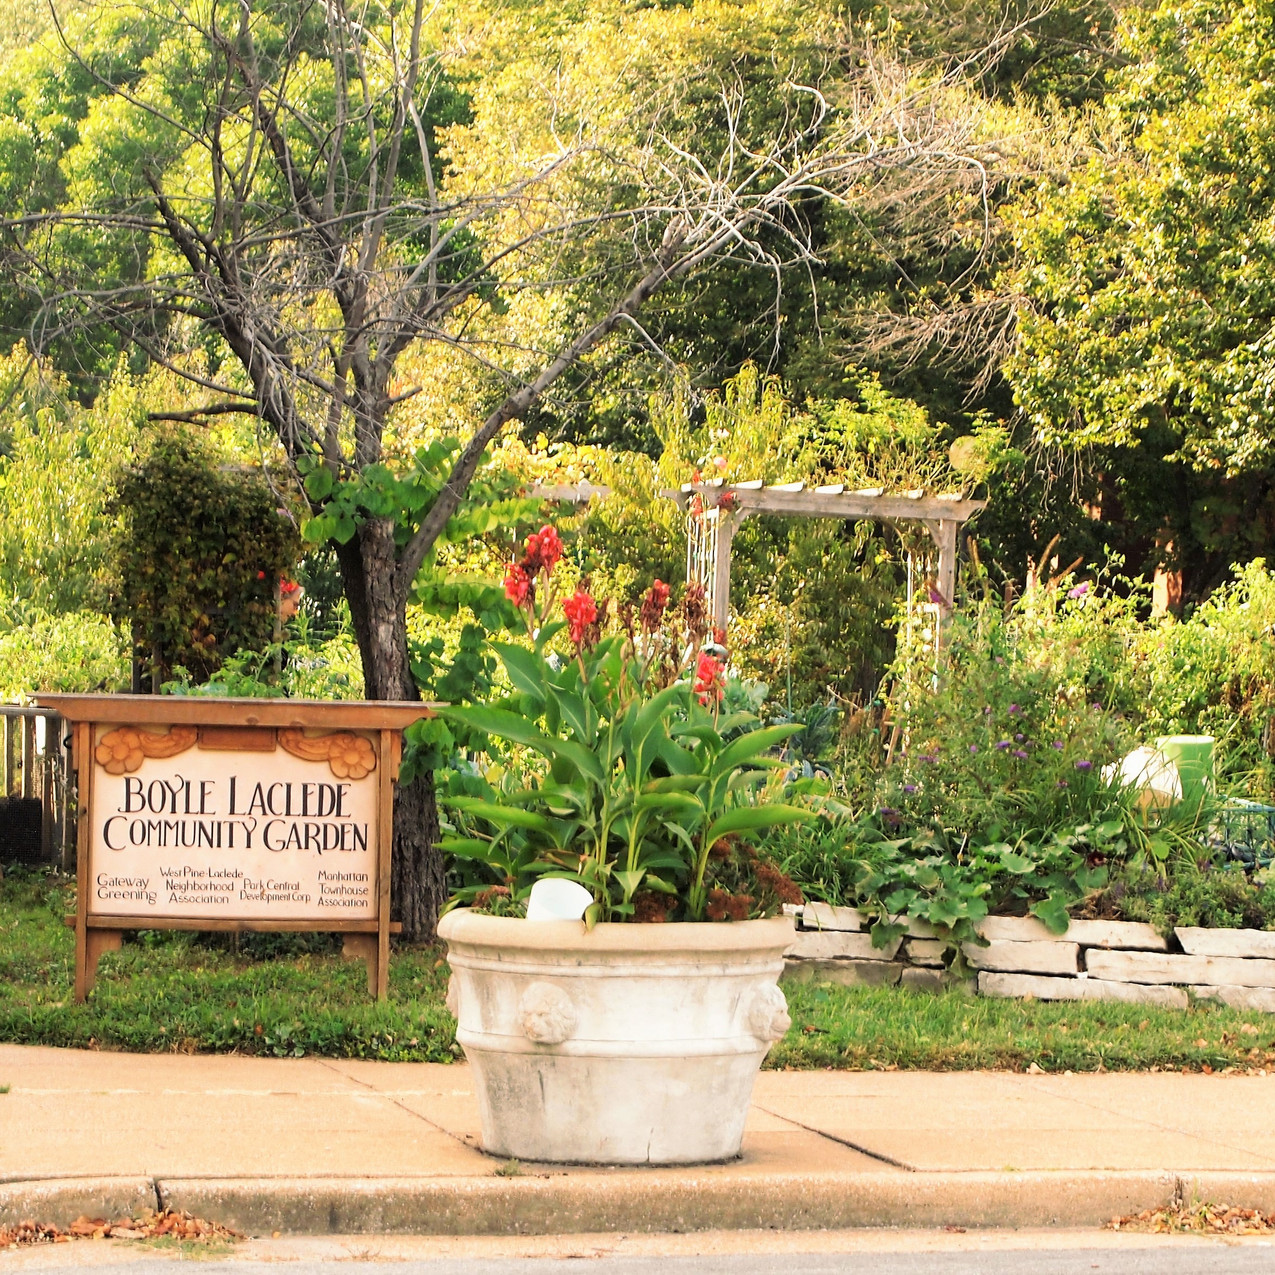 Community Garden - Boyle & Laclede 63108